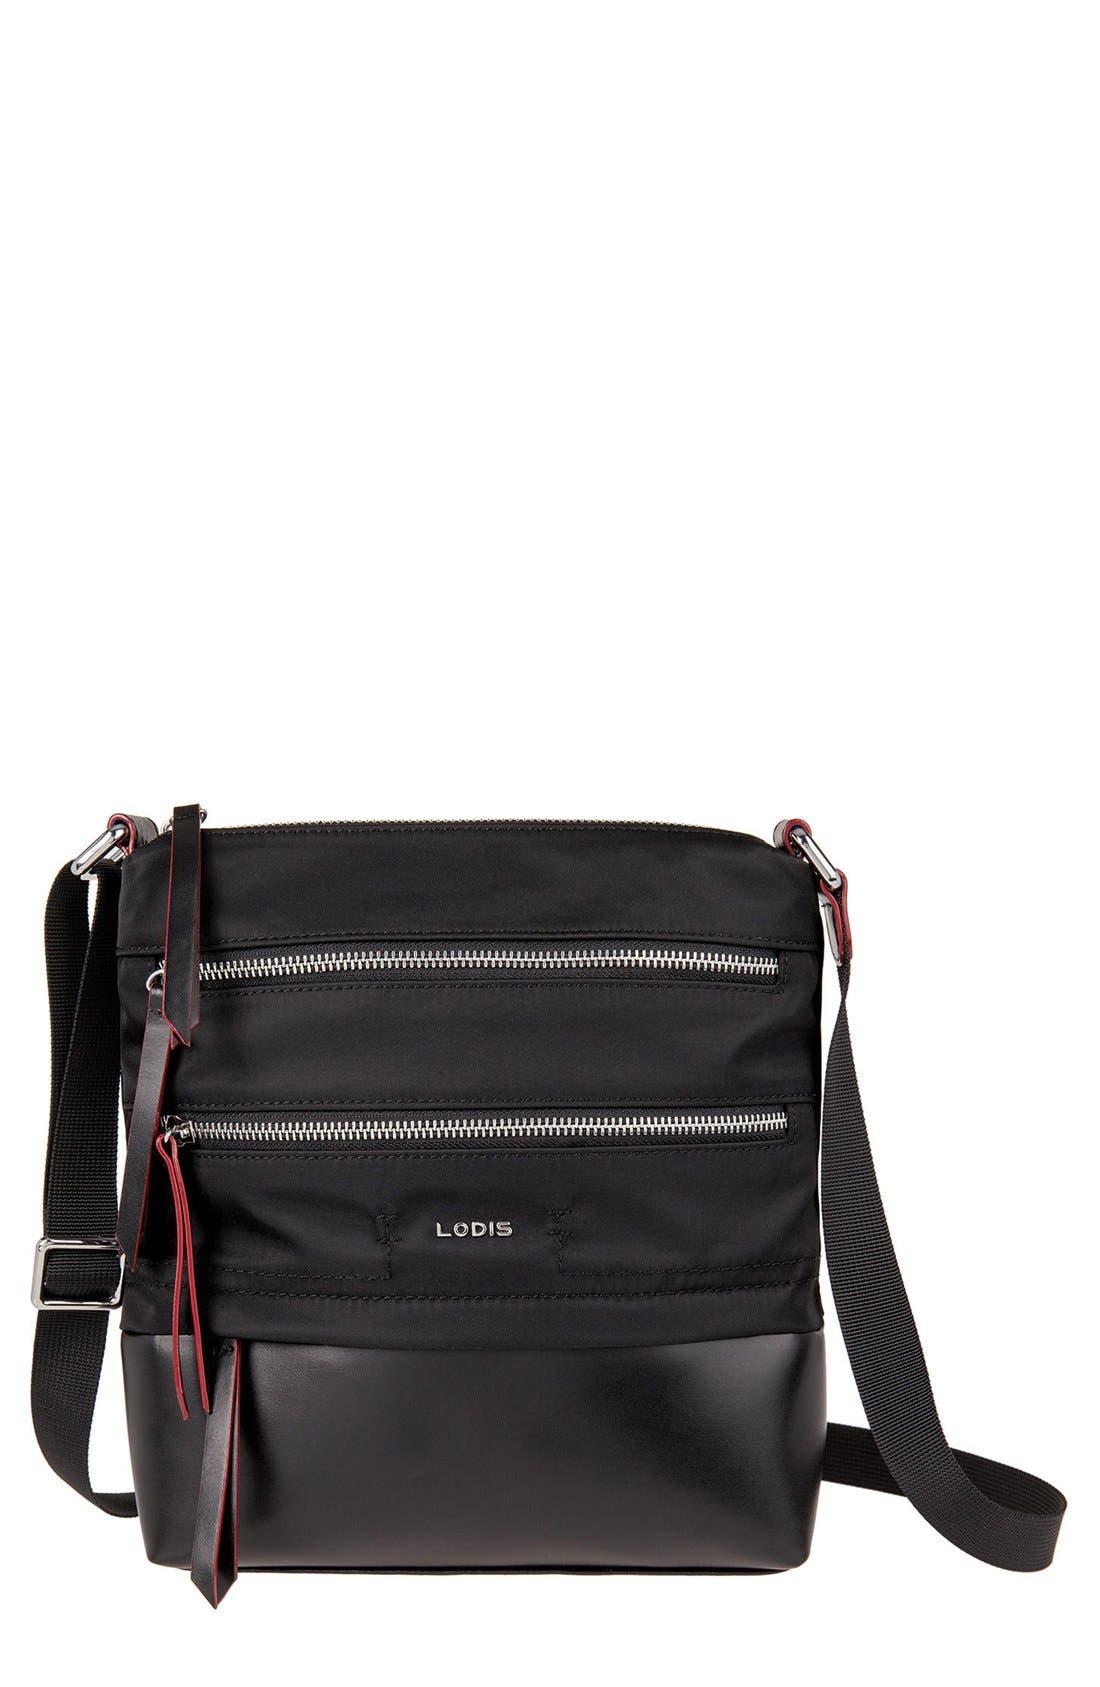 Wanda RFID Nylon & Leather Crossbody Bag,                             Main thumbnail 1, color,                             Black